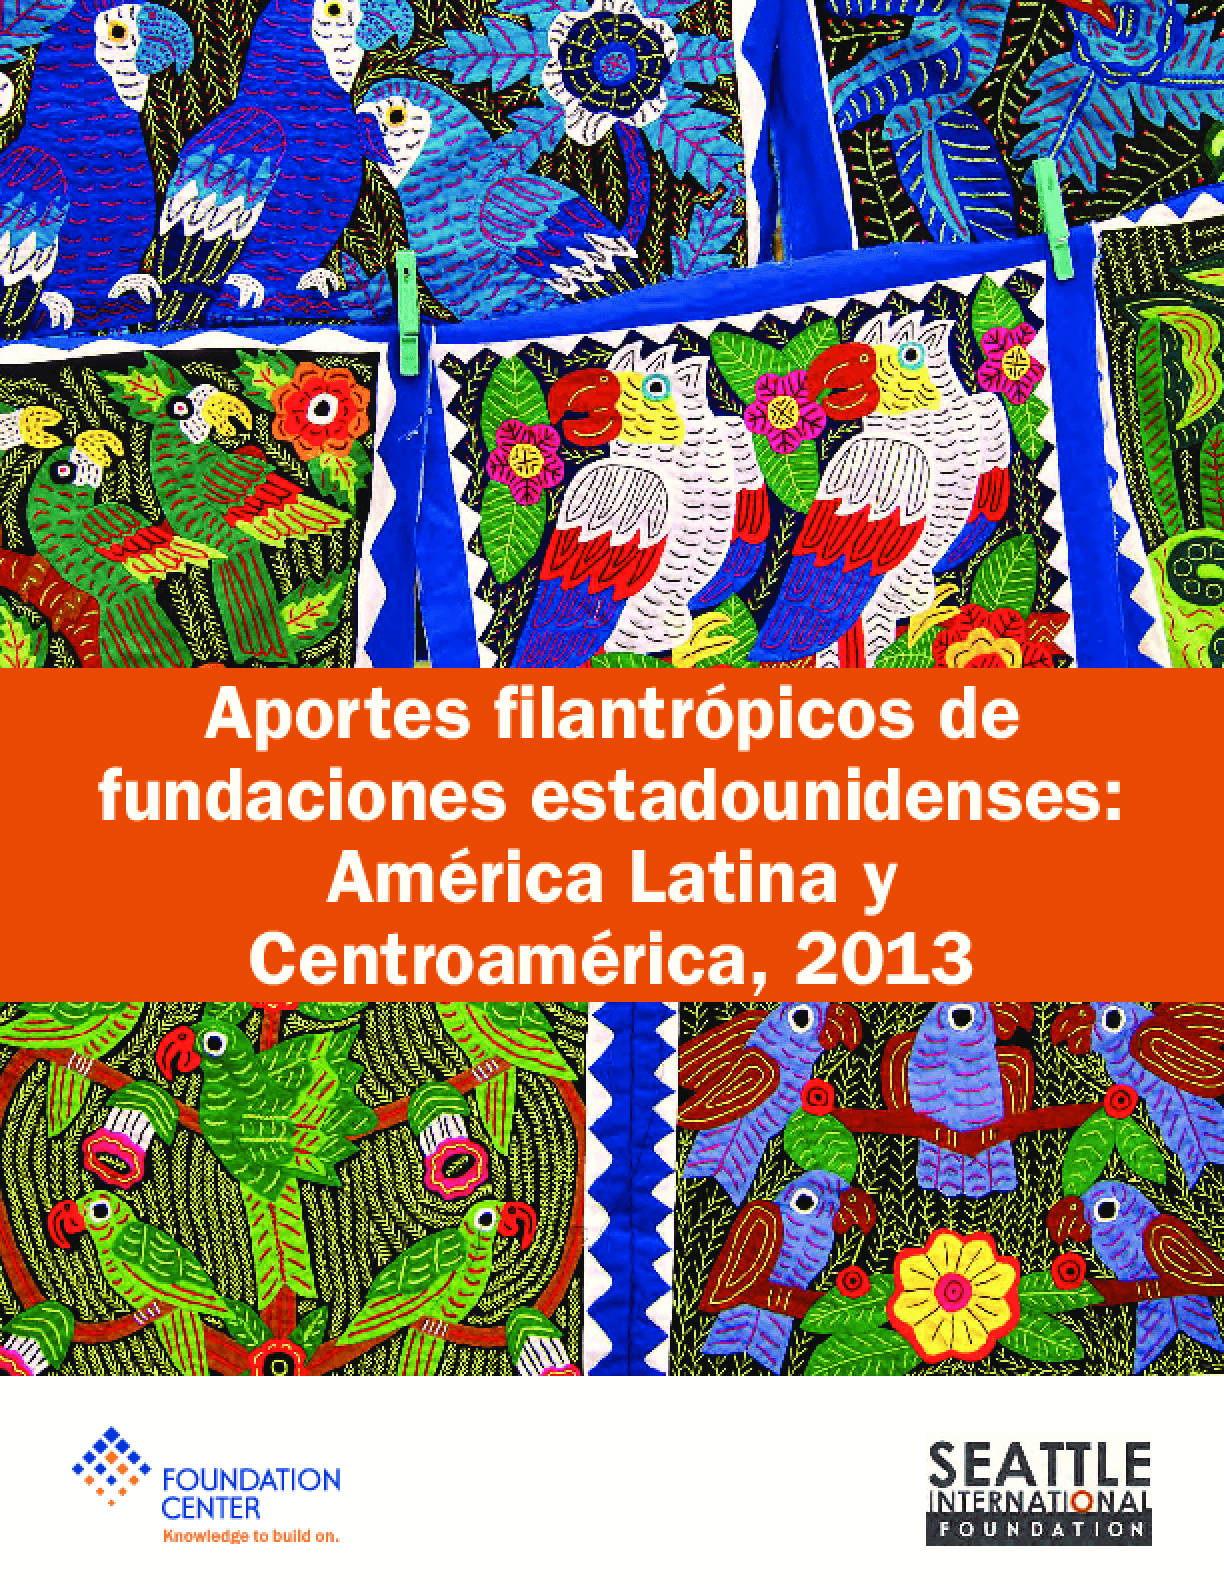 Aportes filantrópicos de fundaciones estadounidenses: América Latina y Centroamérica,2013